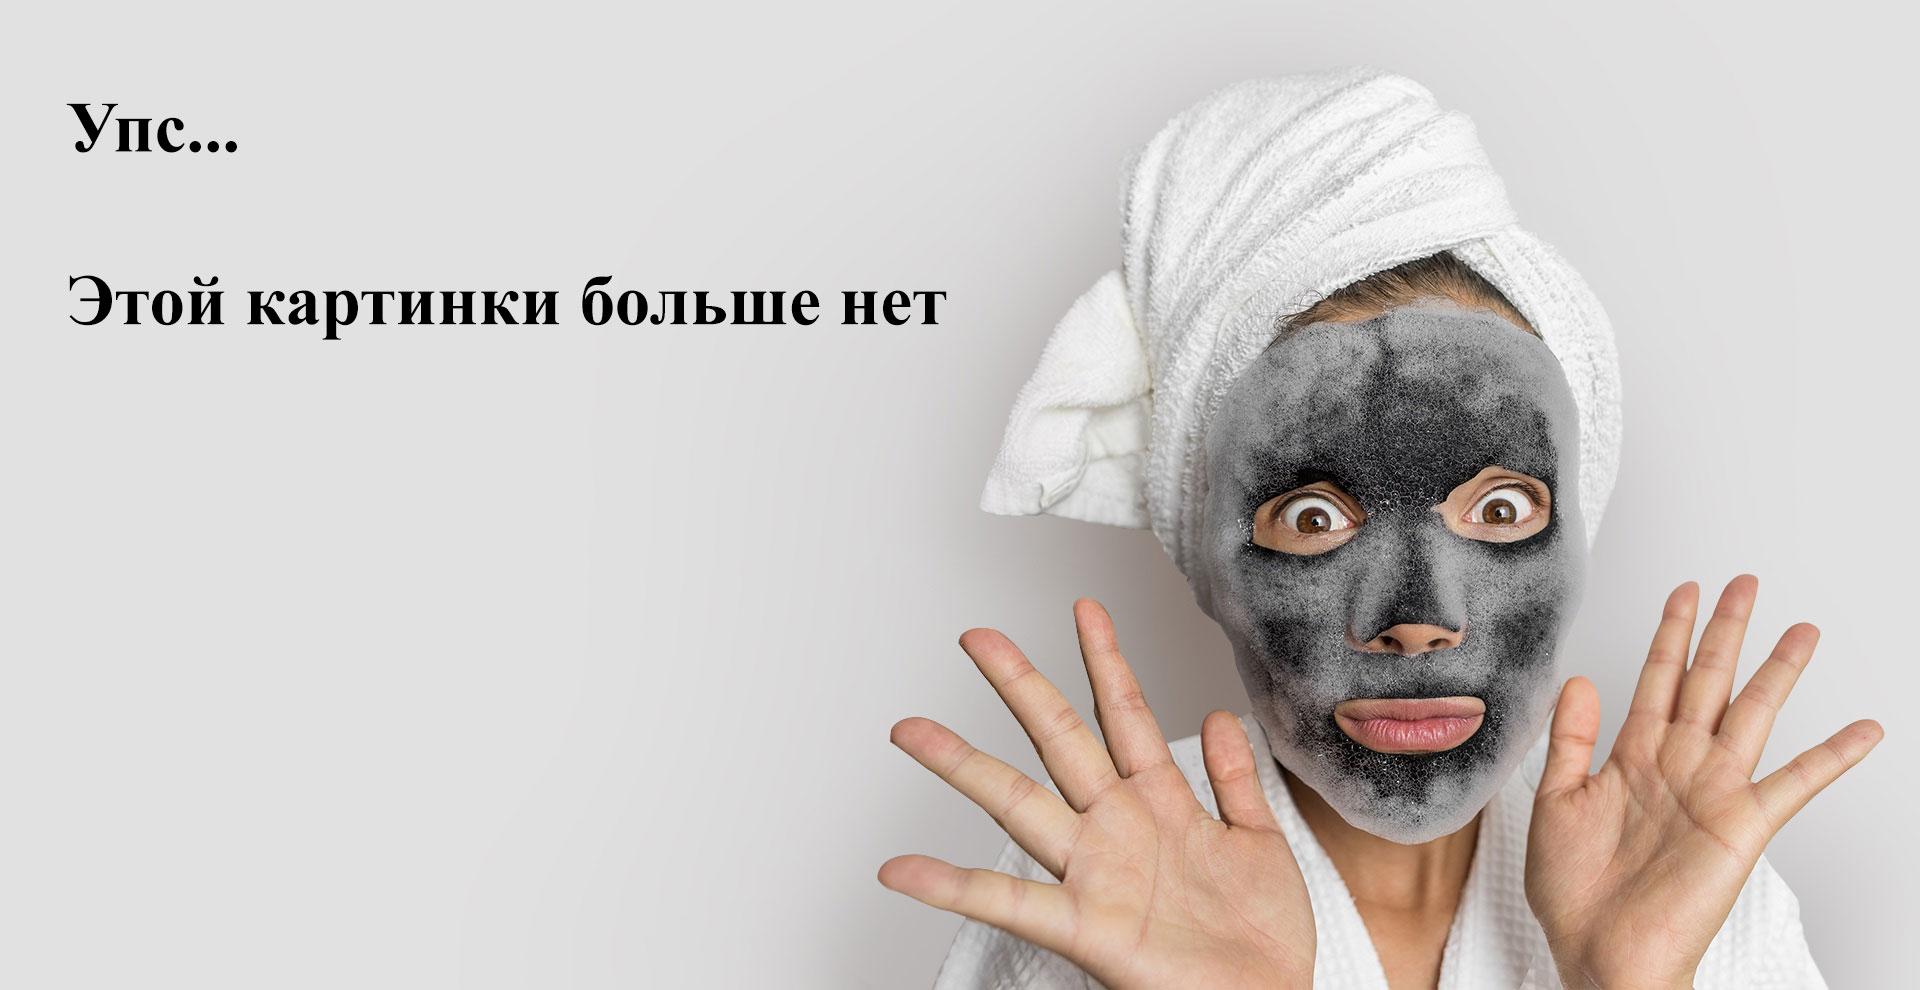 Patrisa Nail, Гель-лак Московская сага №750